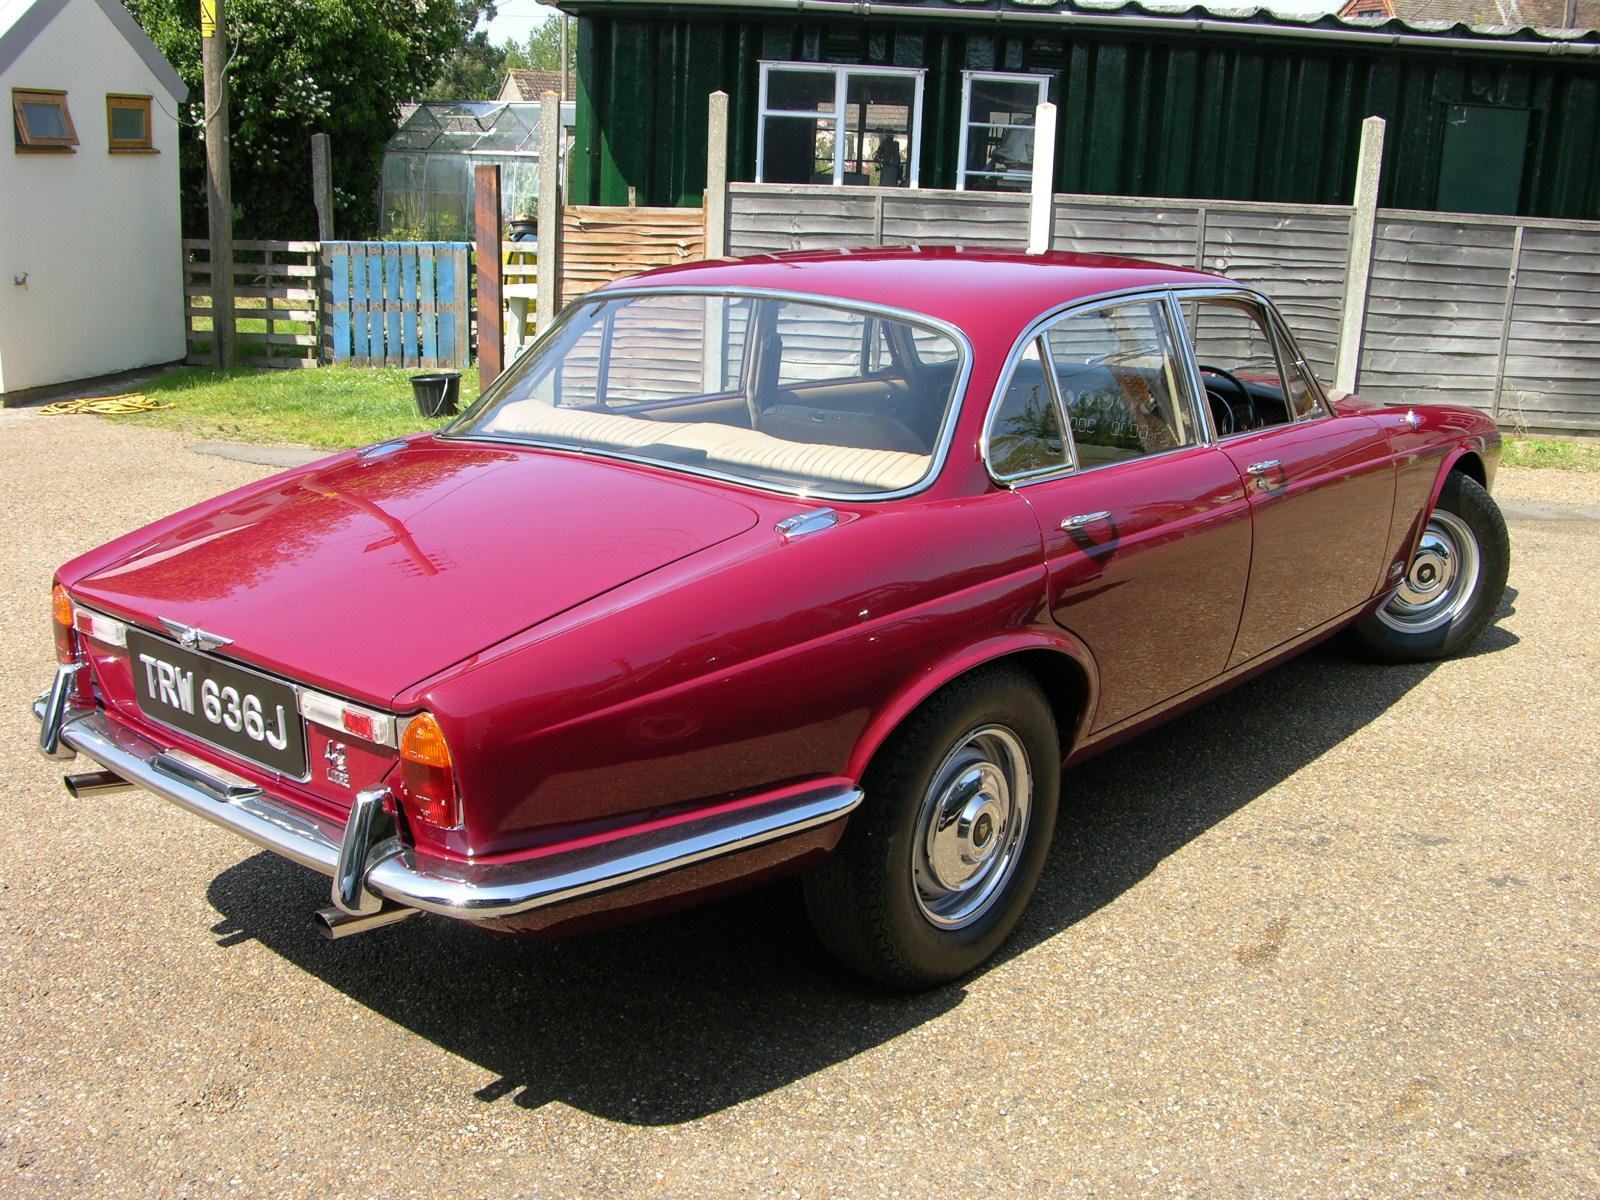 File:1970 Jaguar XJ6 4.2 Series 1 - Flickr - The Car Spy (5).jpg - Wikimedia Commons